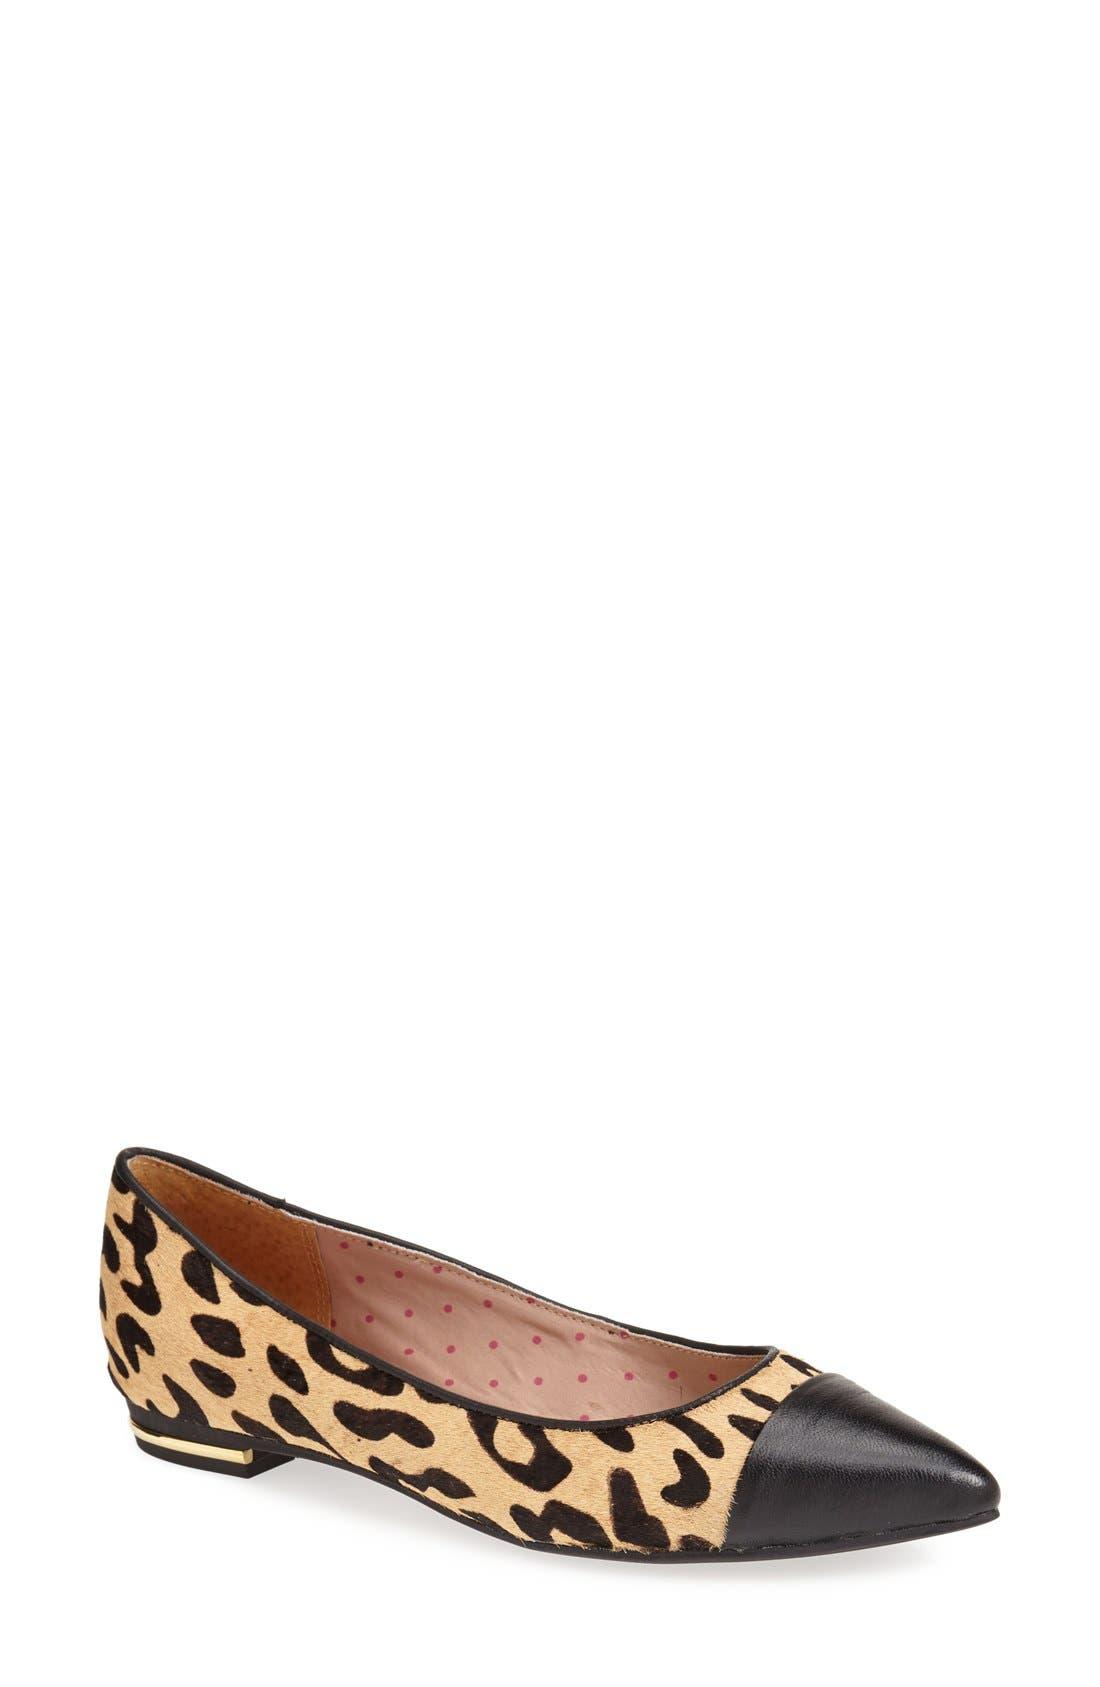 Main Image - Isaac Mizrahi New York 'Gayle' Pointy Toe Flat (Women)